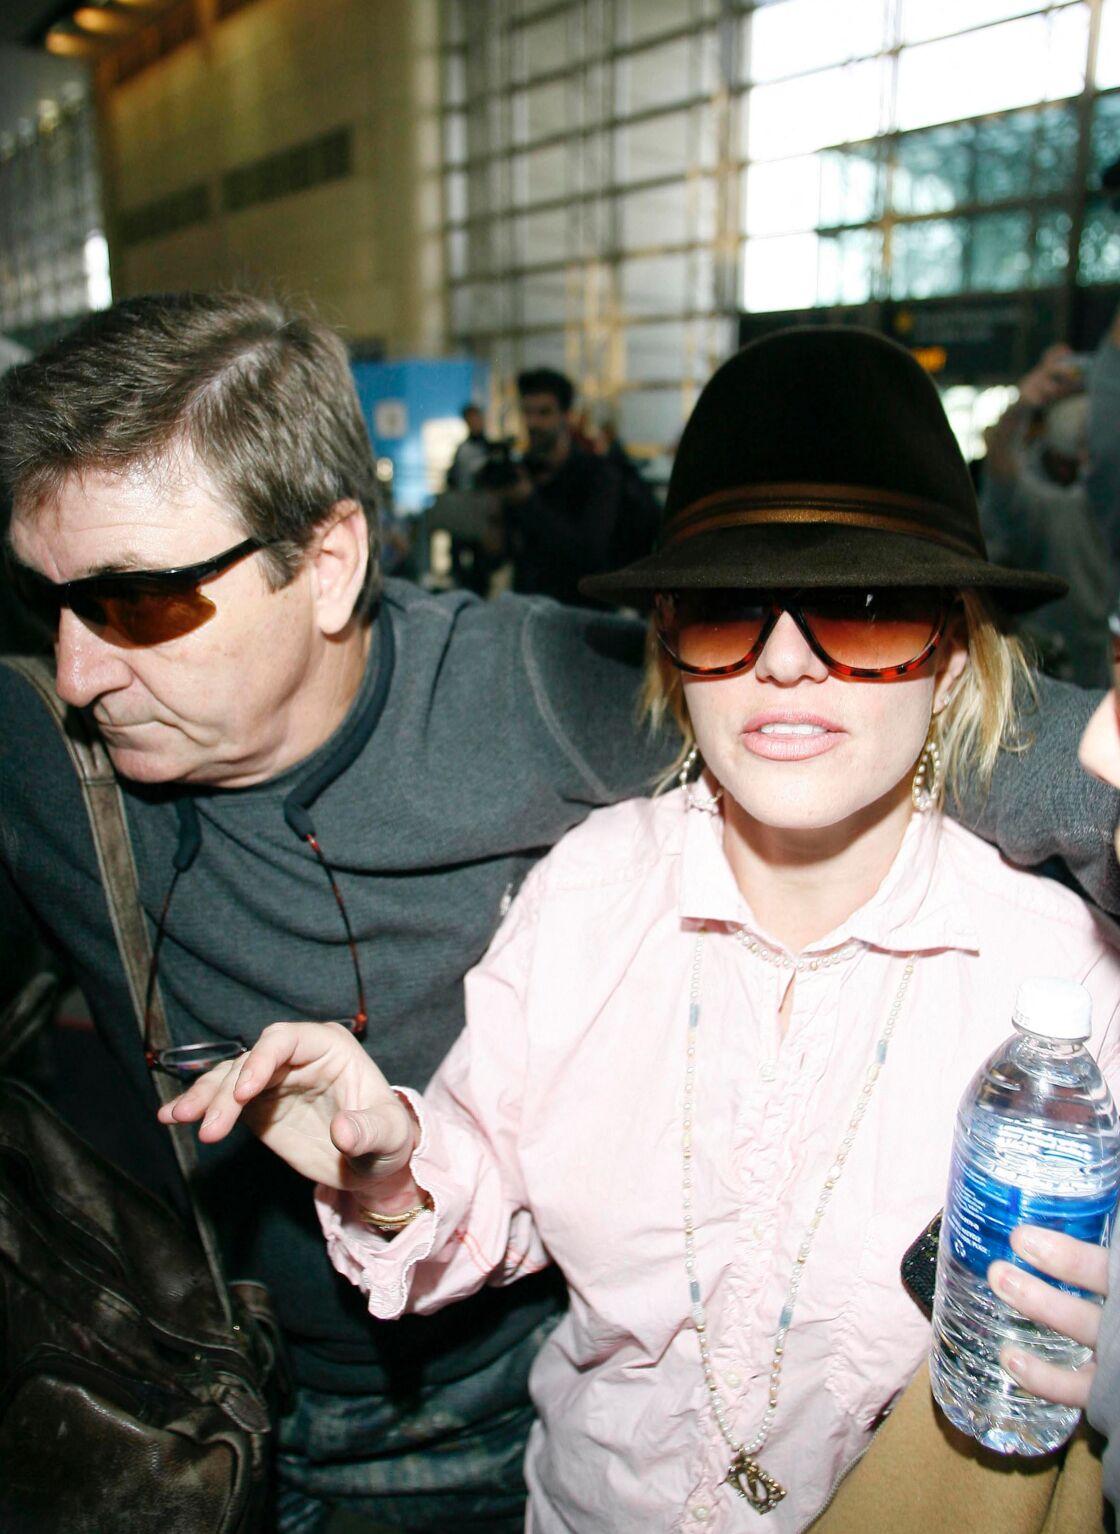 Britney Spears et son père, Jame Spears, en 2008